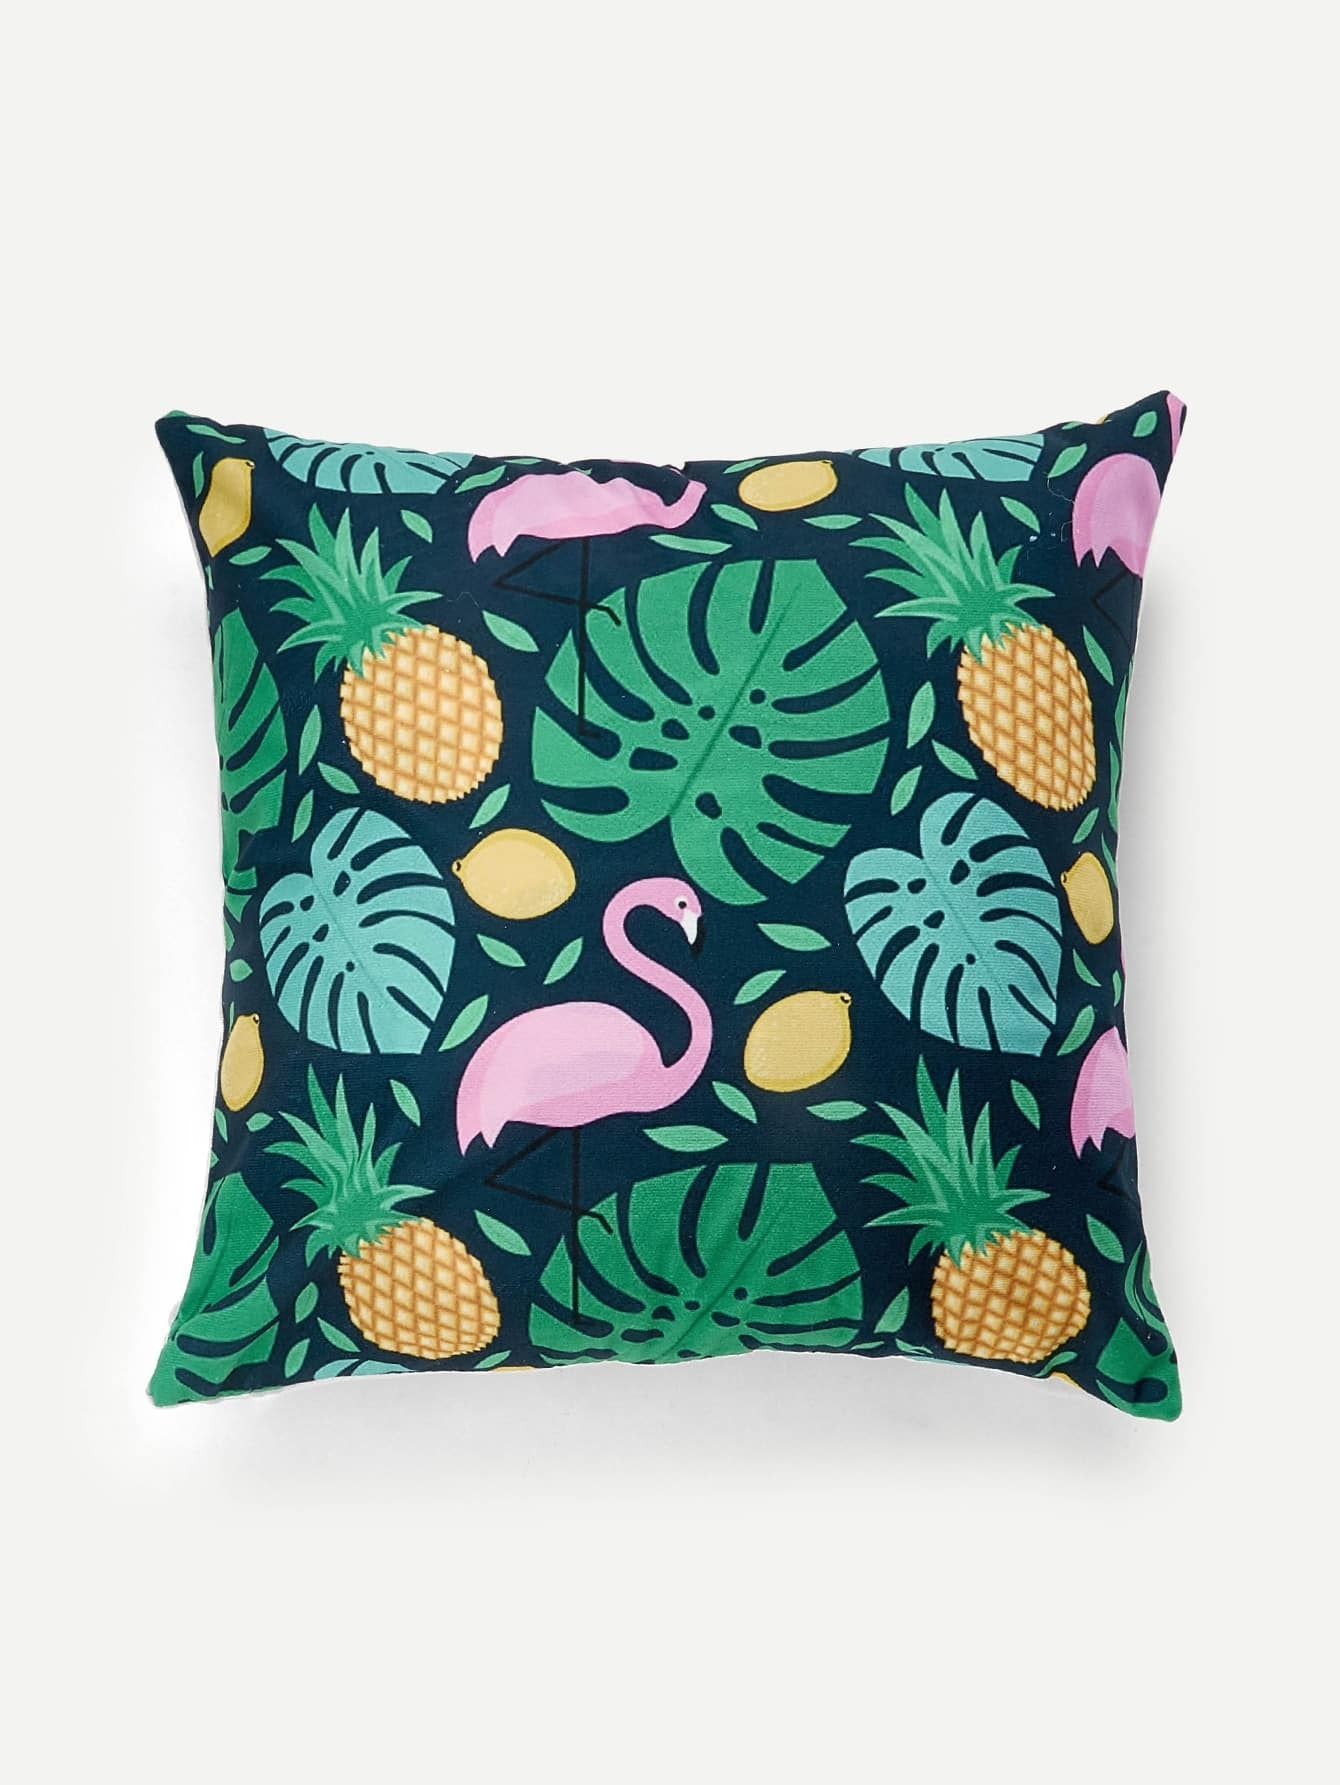 Flamingo & Pineapple Print Cushion Cover